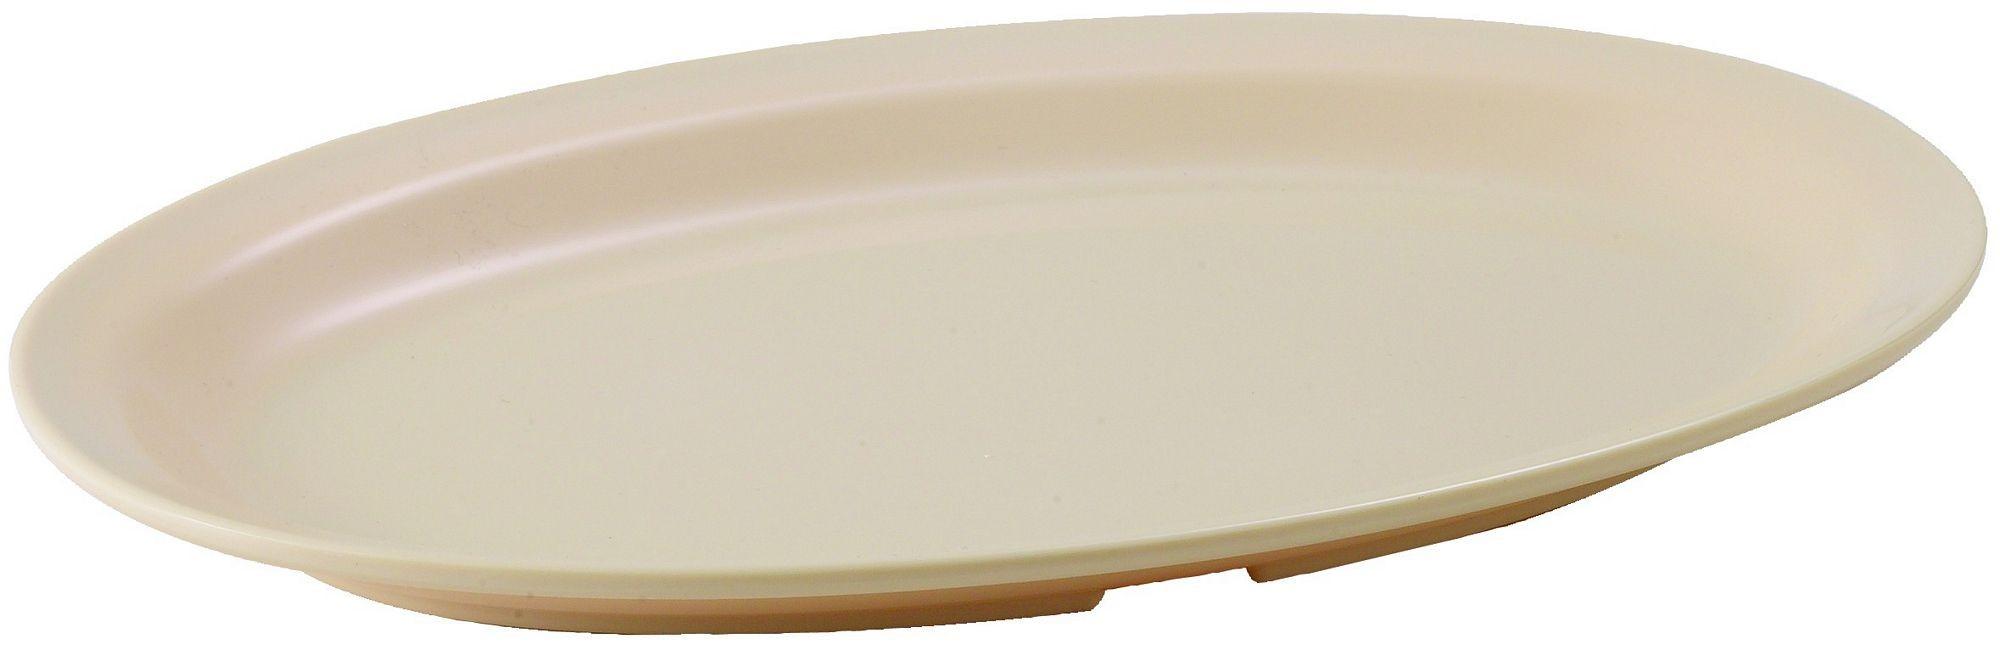 "Winco MMPO-118 Tan Melamine 11 1/2"" x 8"" Oval Platter with Narrow Rim"